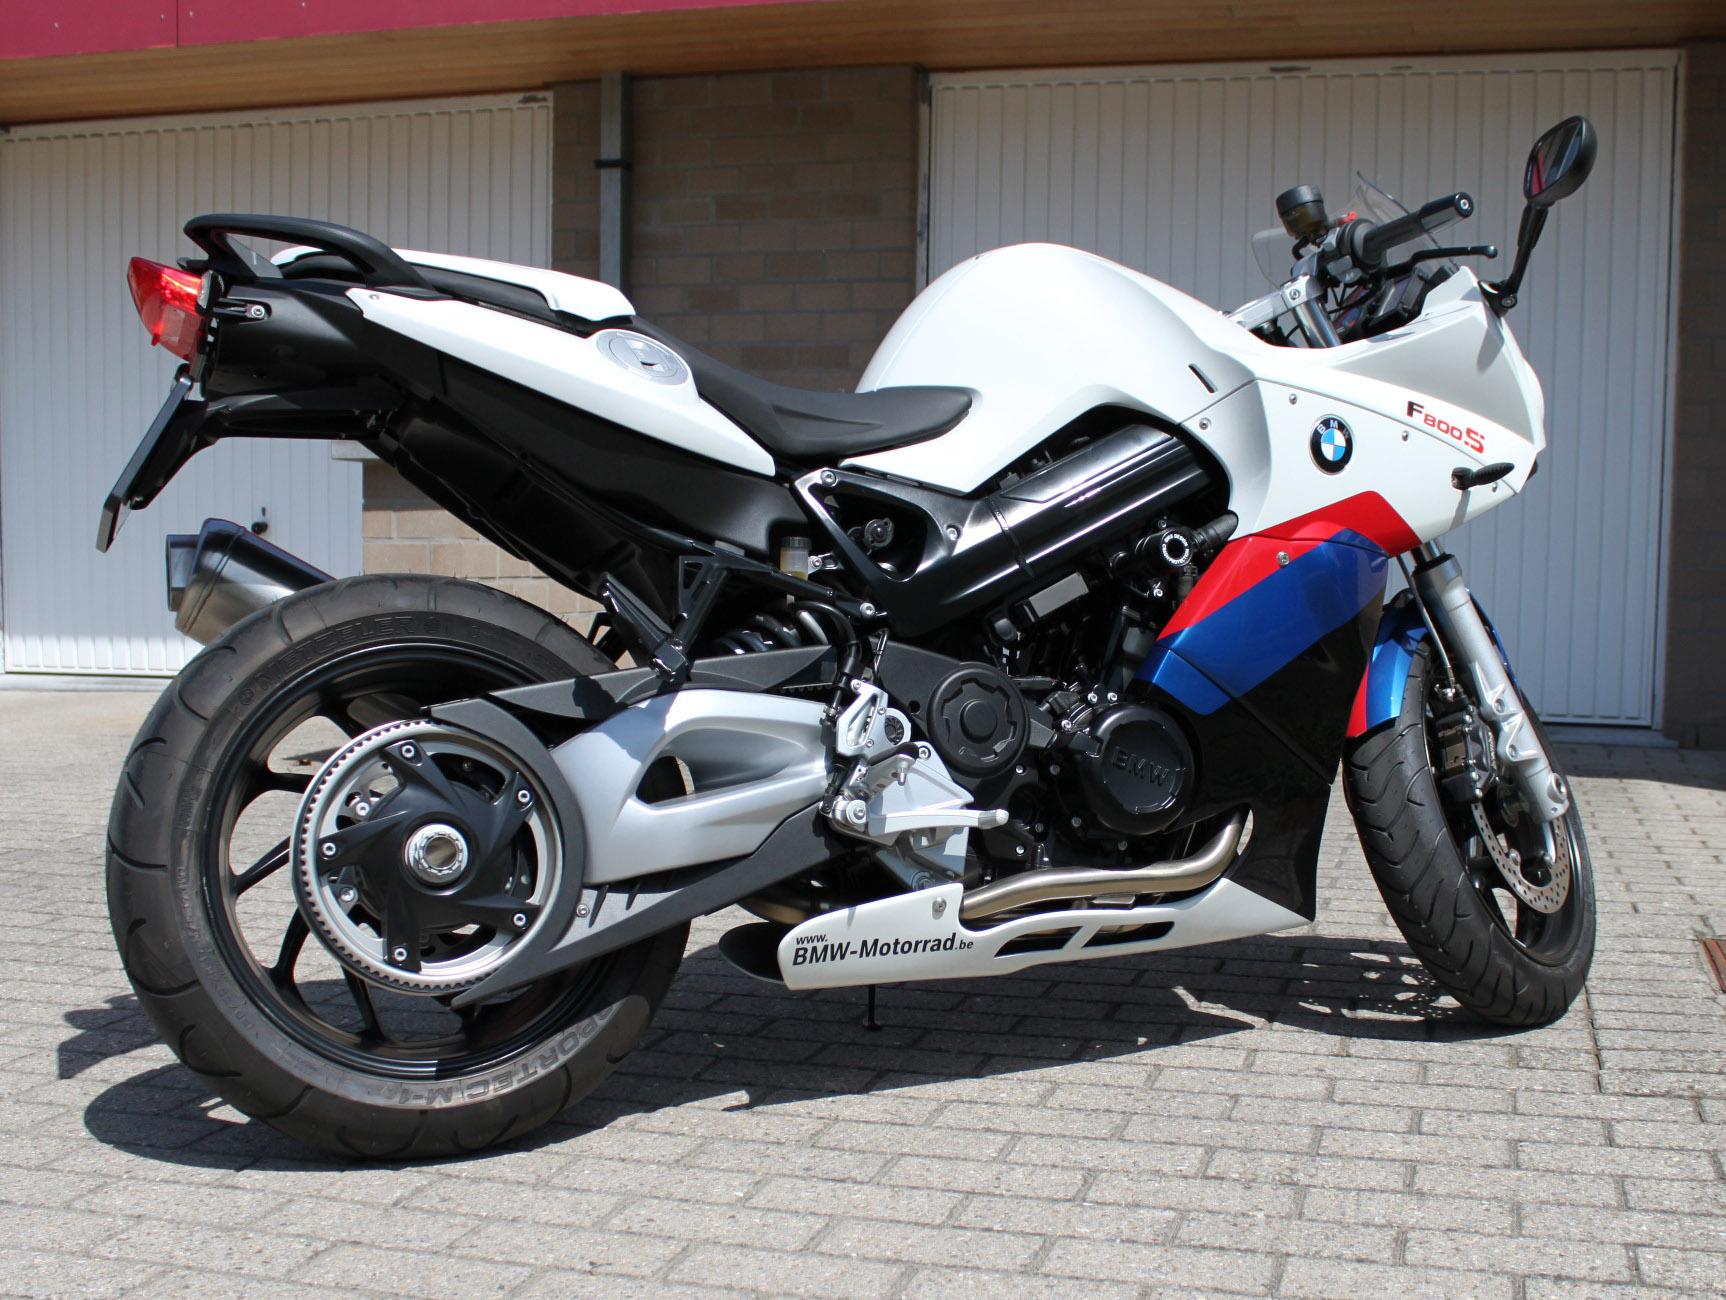 BMW F800S white